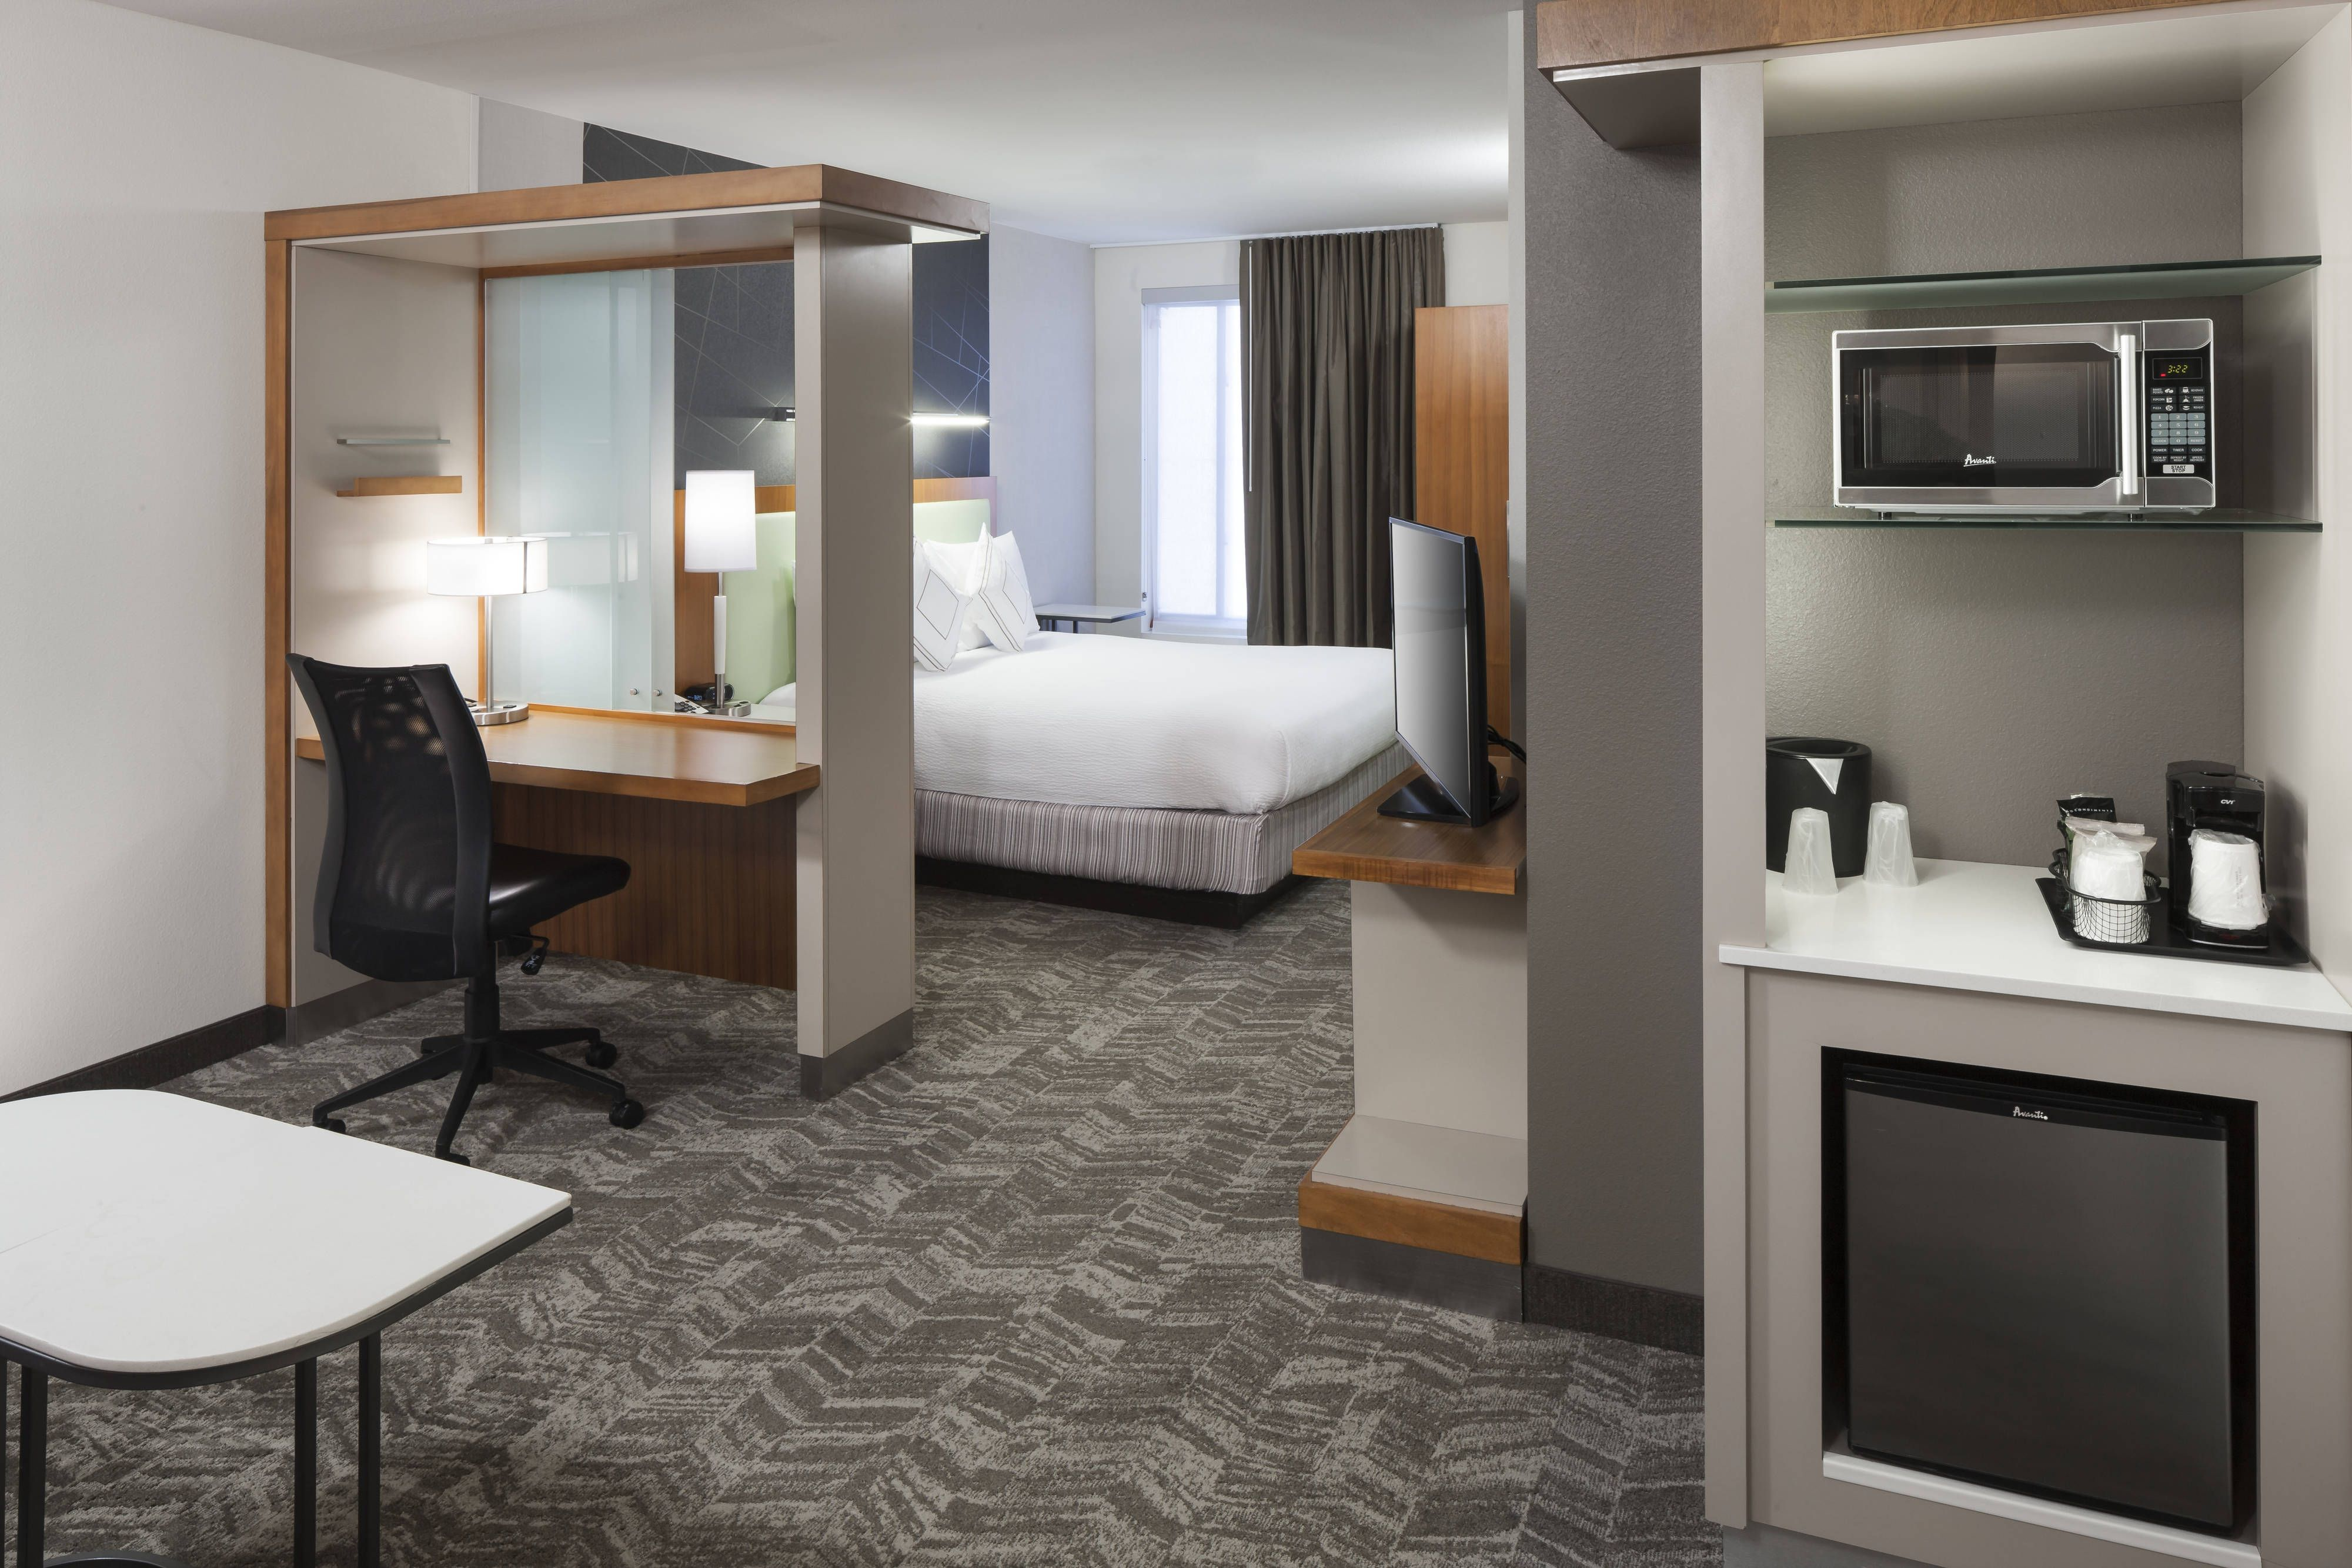 Springhill suites salt lake city airport king suite guestroom